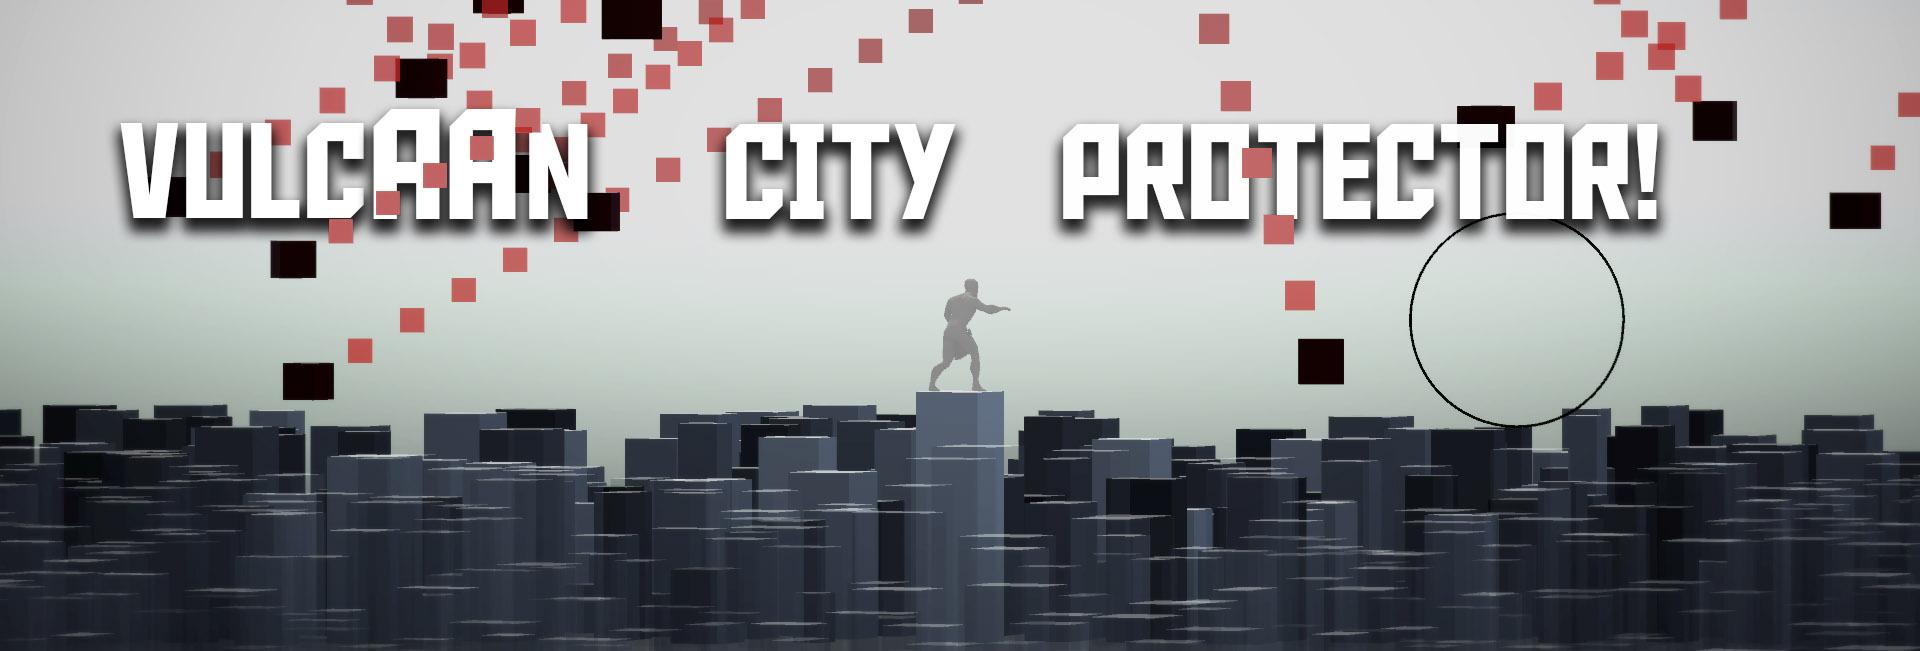 VulcAAn City Protector!